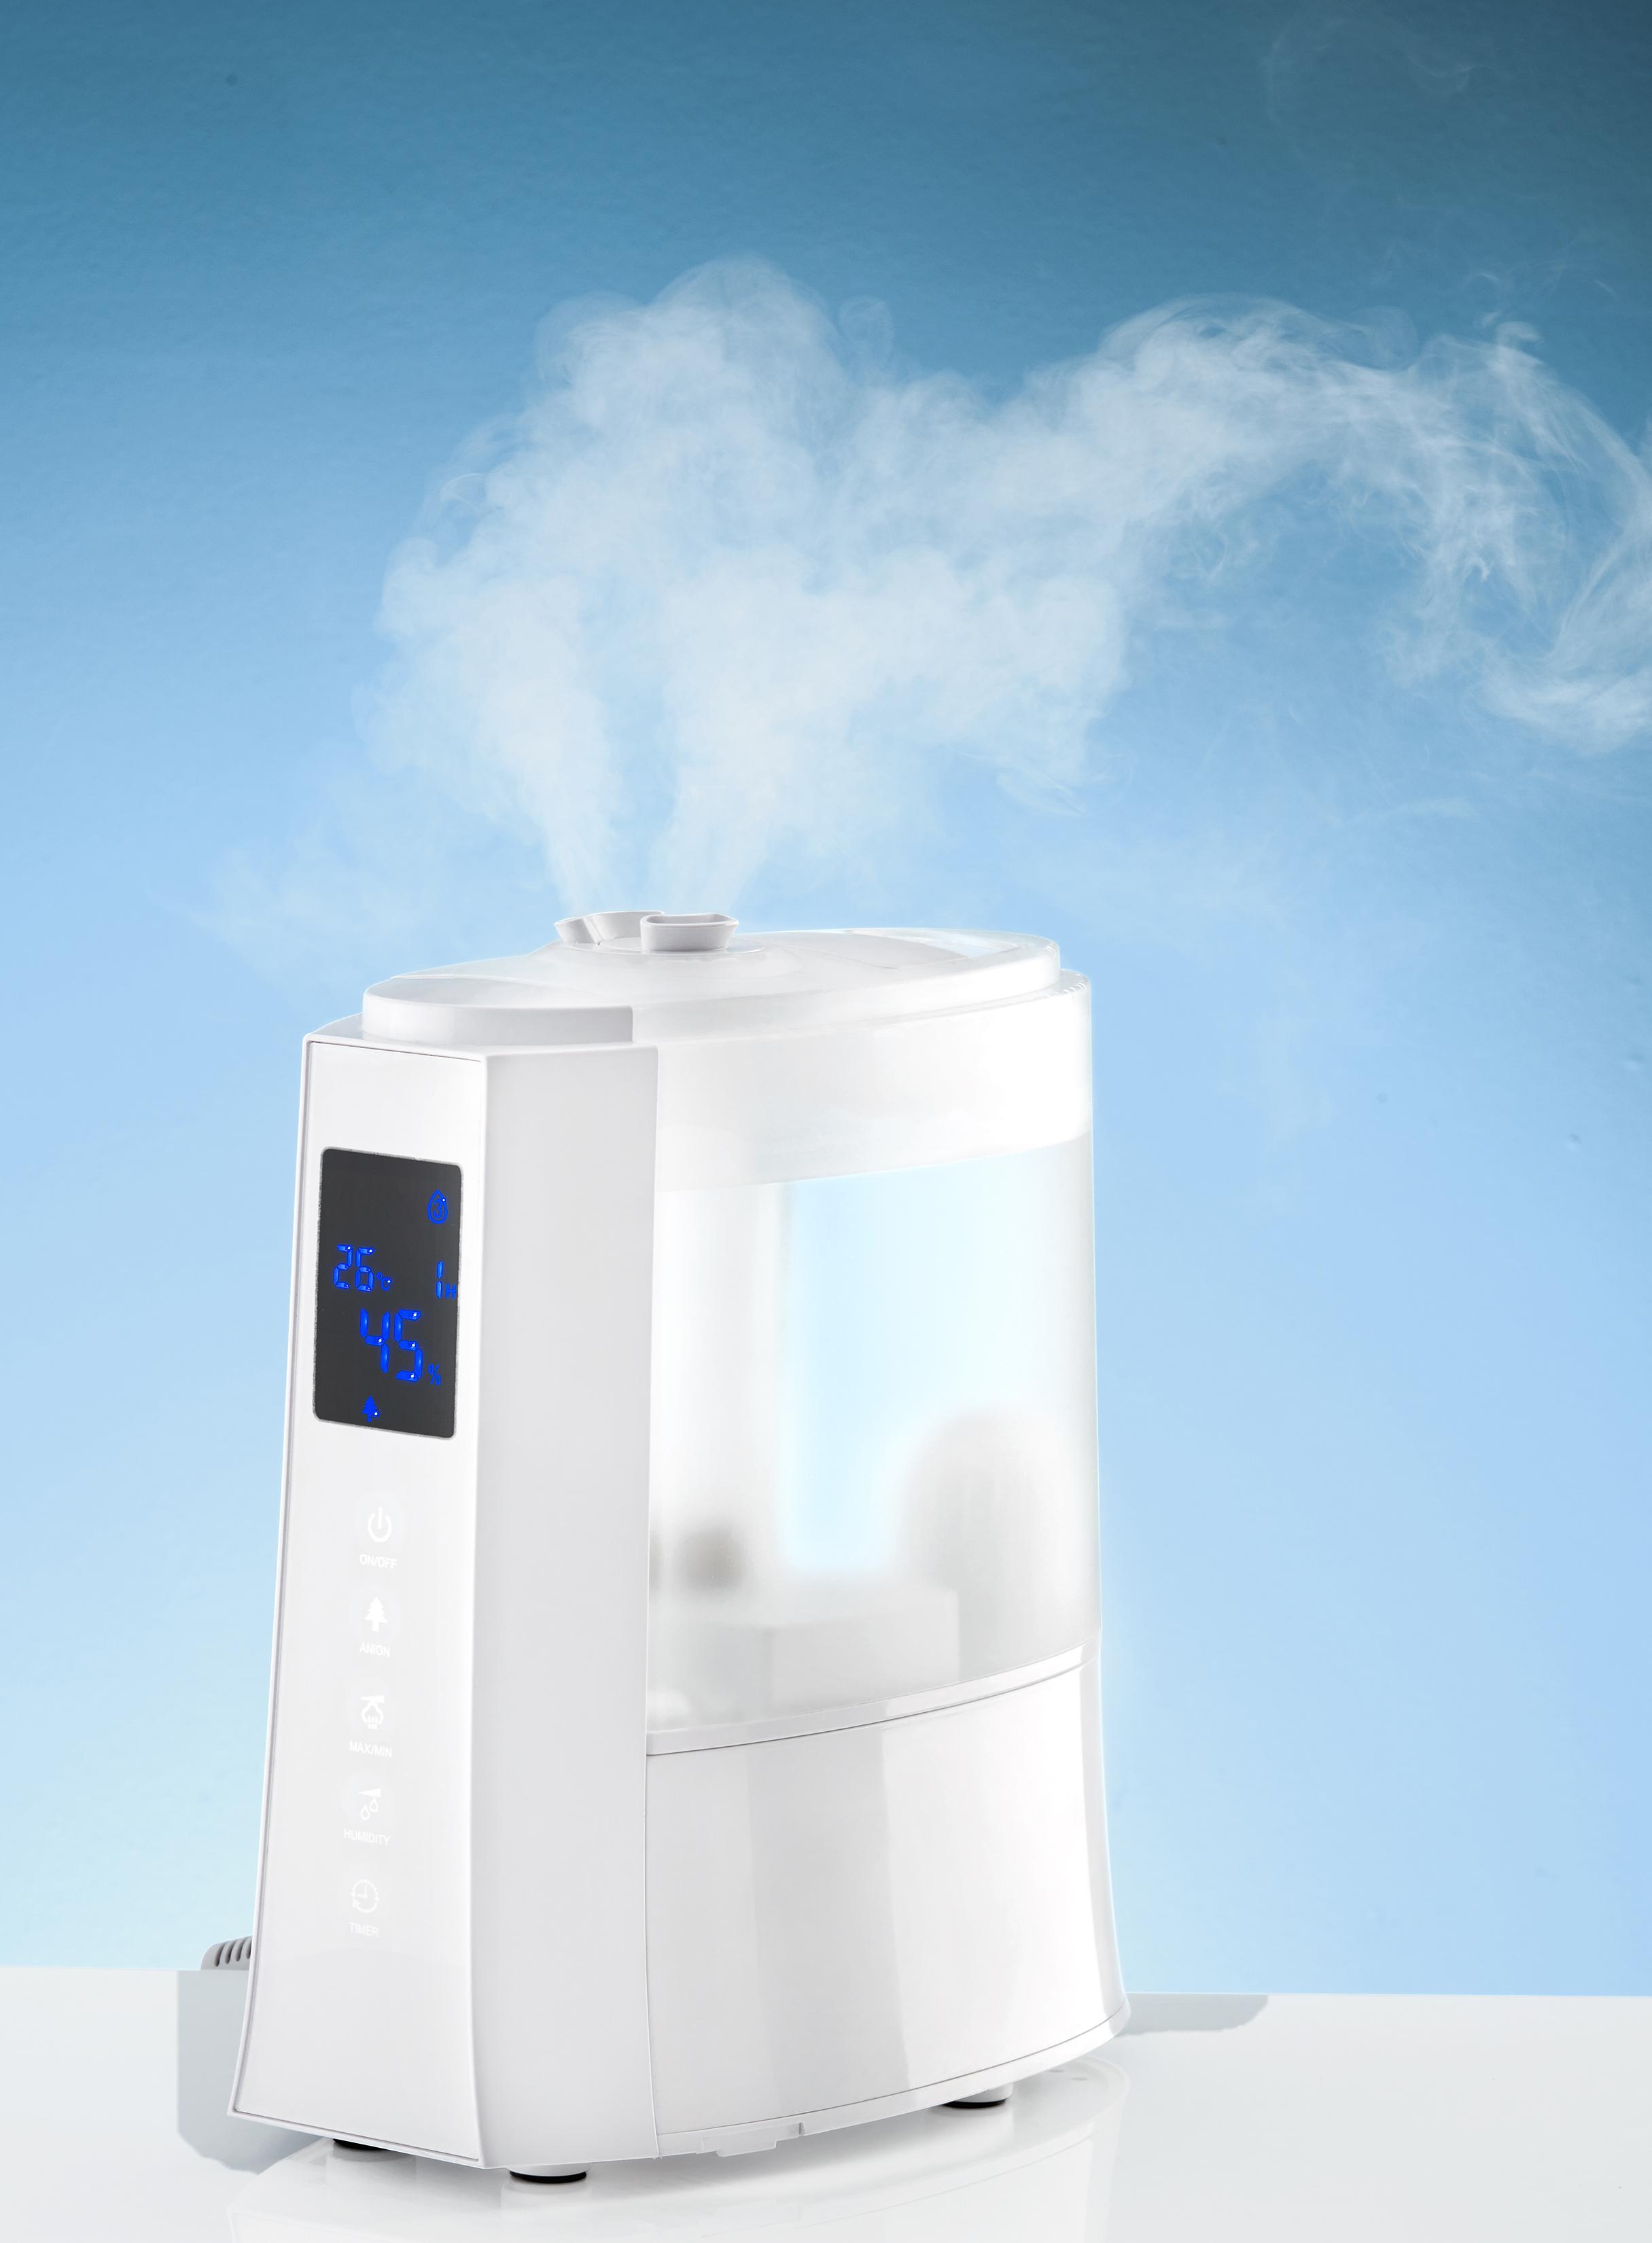 Climate Cli Ah300 Ultrasonic Cool Mist Humidifier